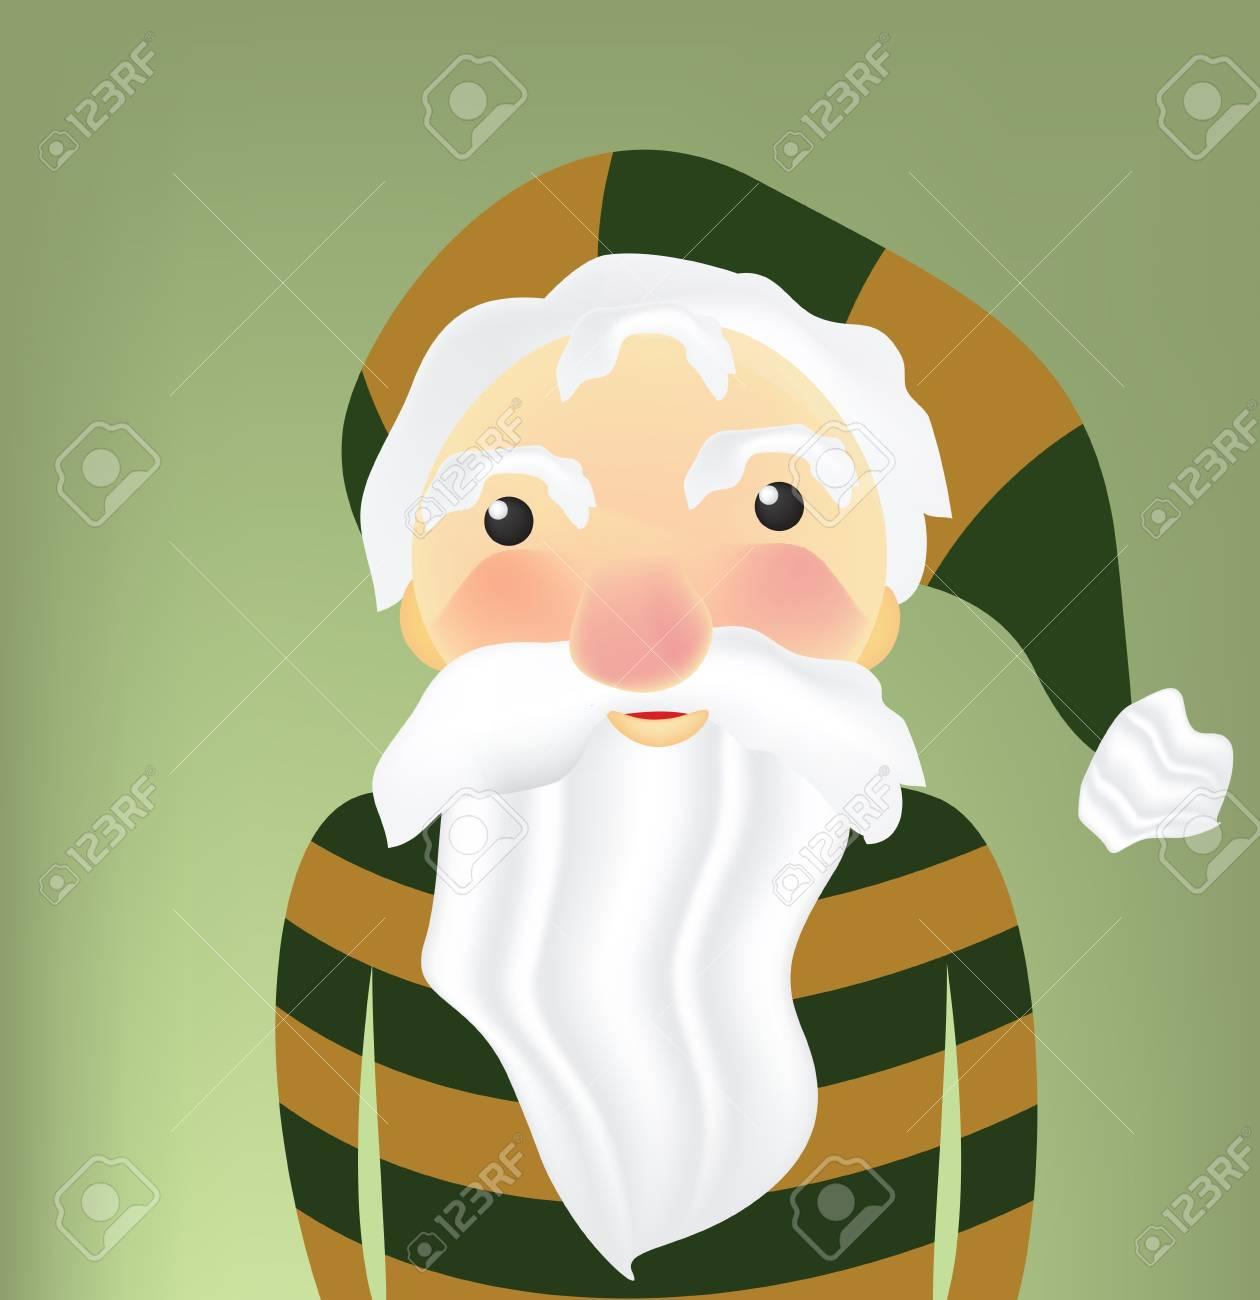 Illustration of Christmas Elf Stock Vector - 16166351